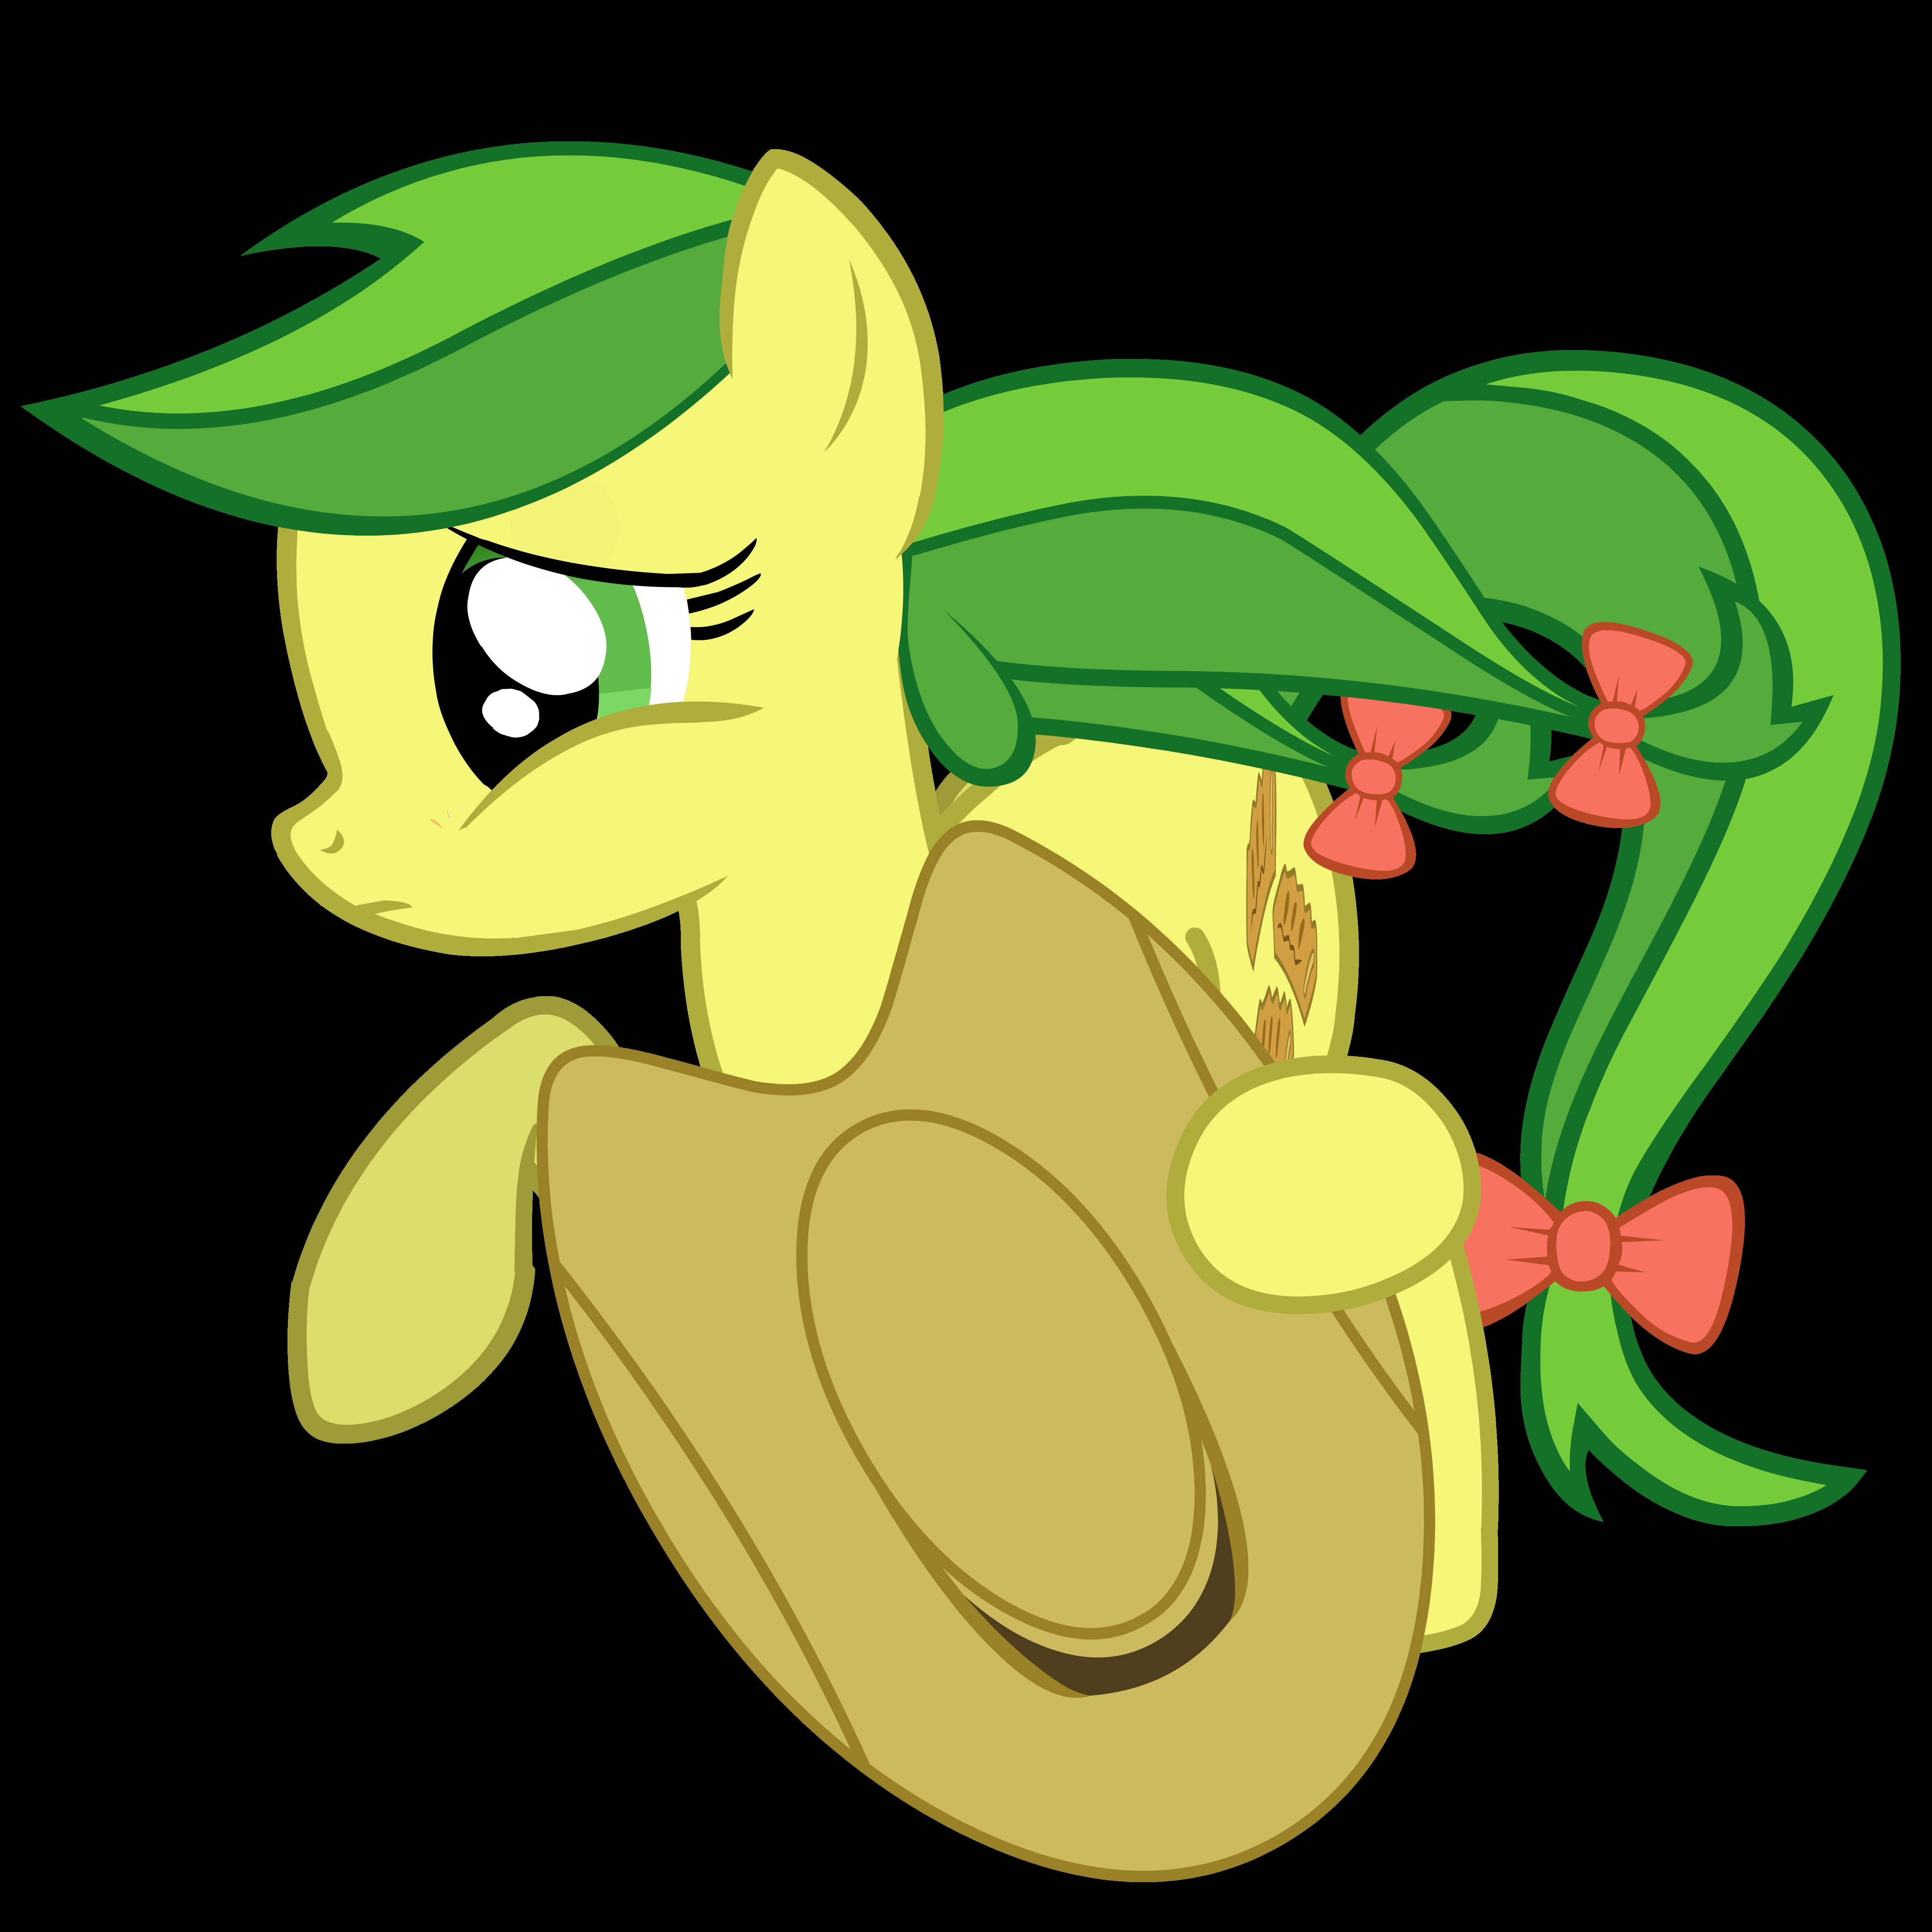 My little pony apple fritter - photo#7